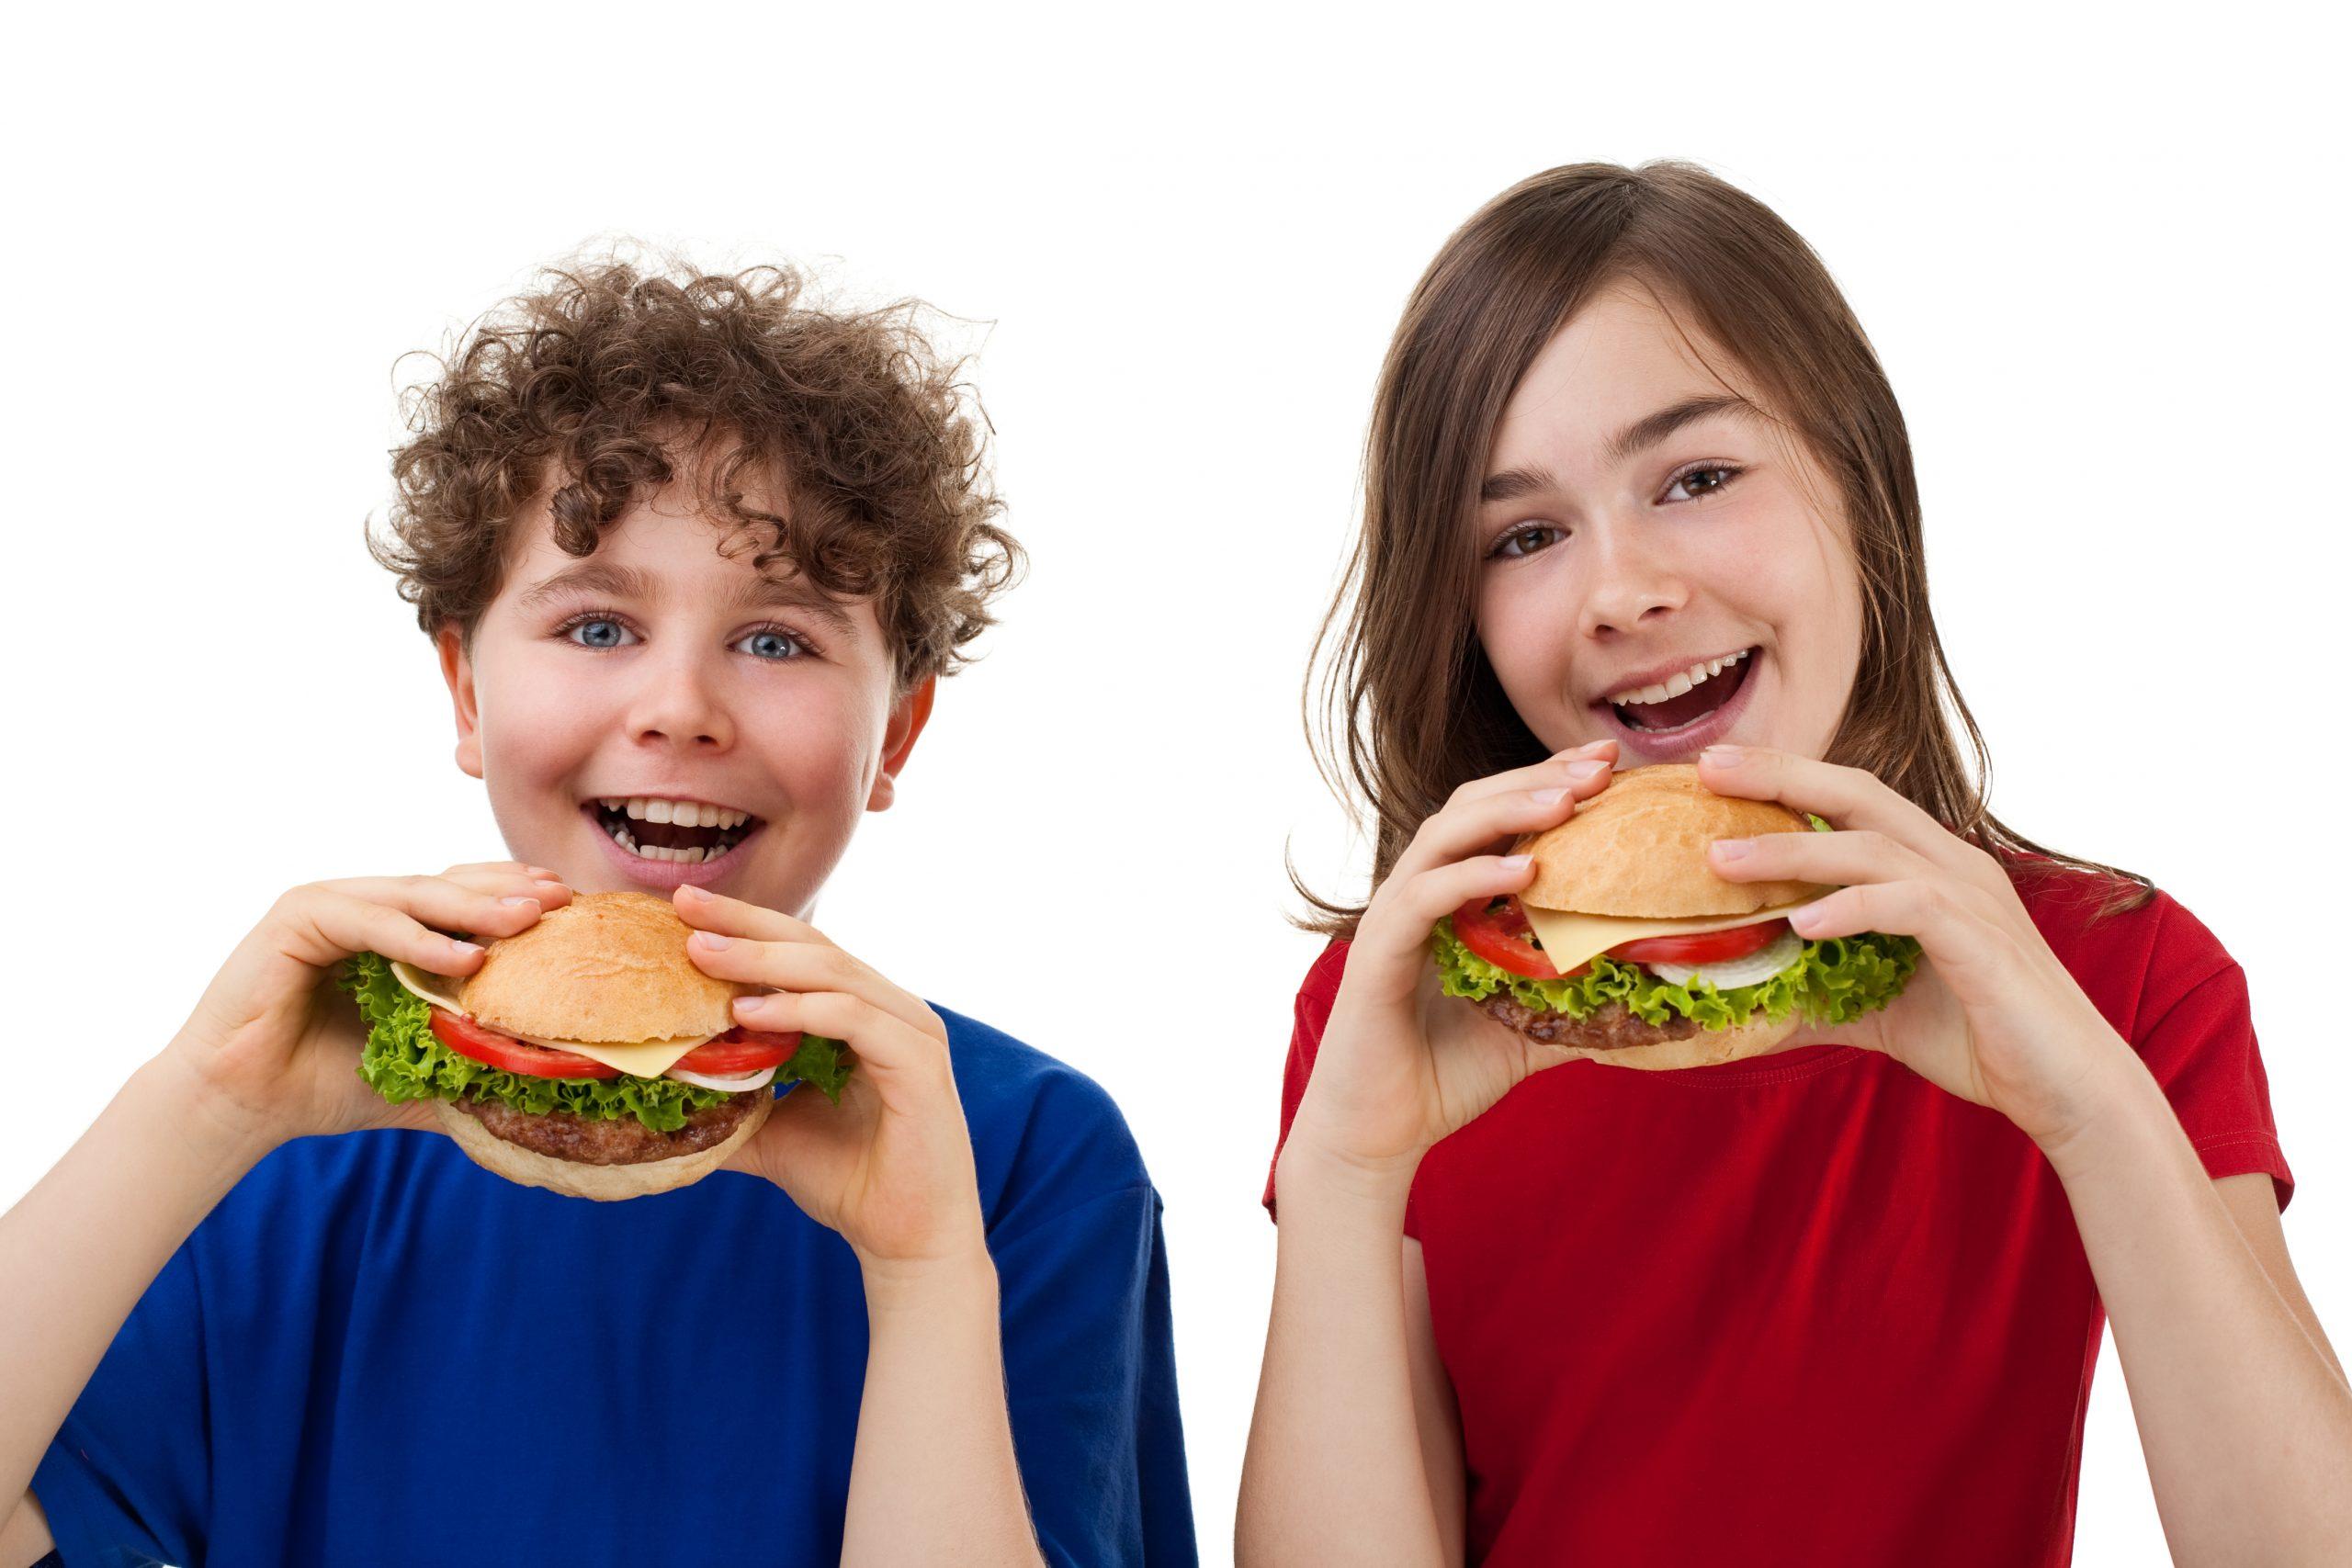 Kids eating burgers